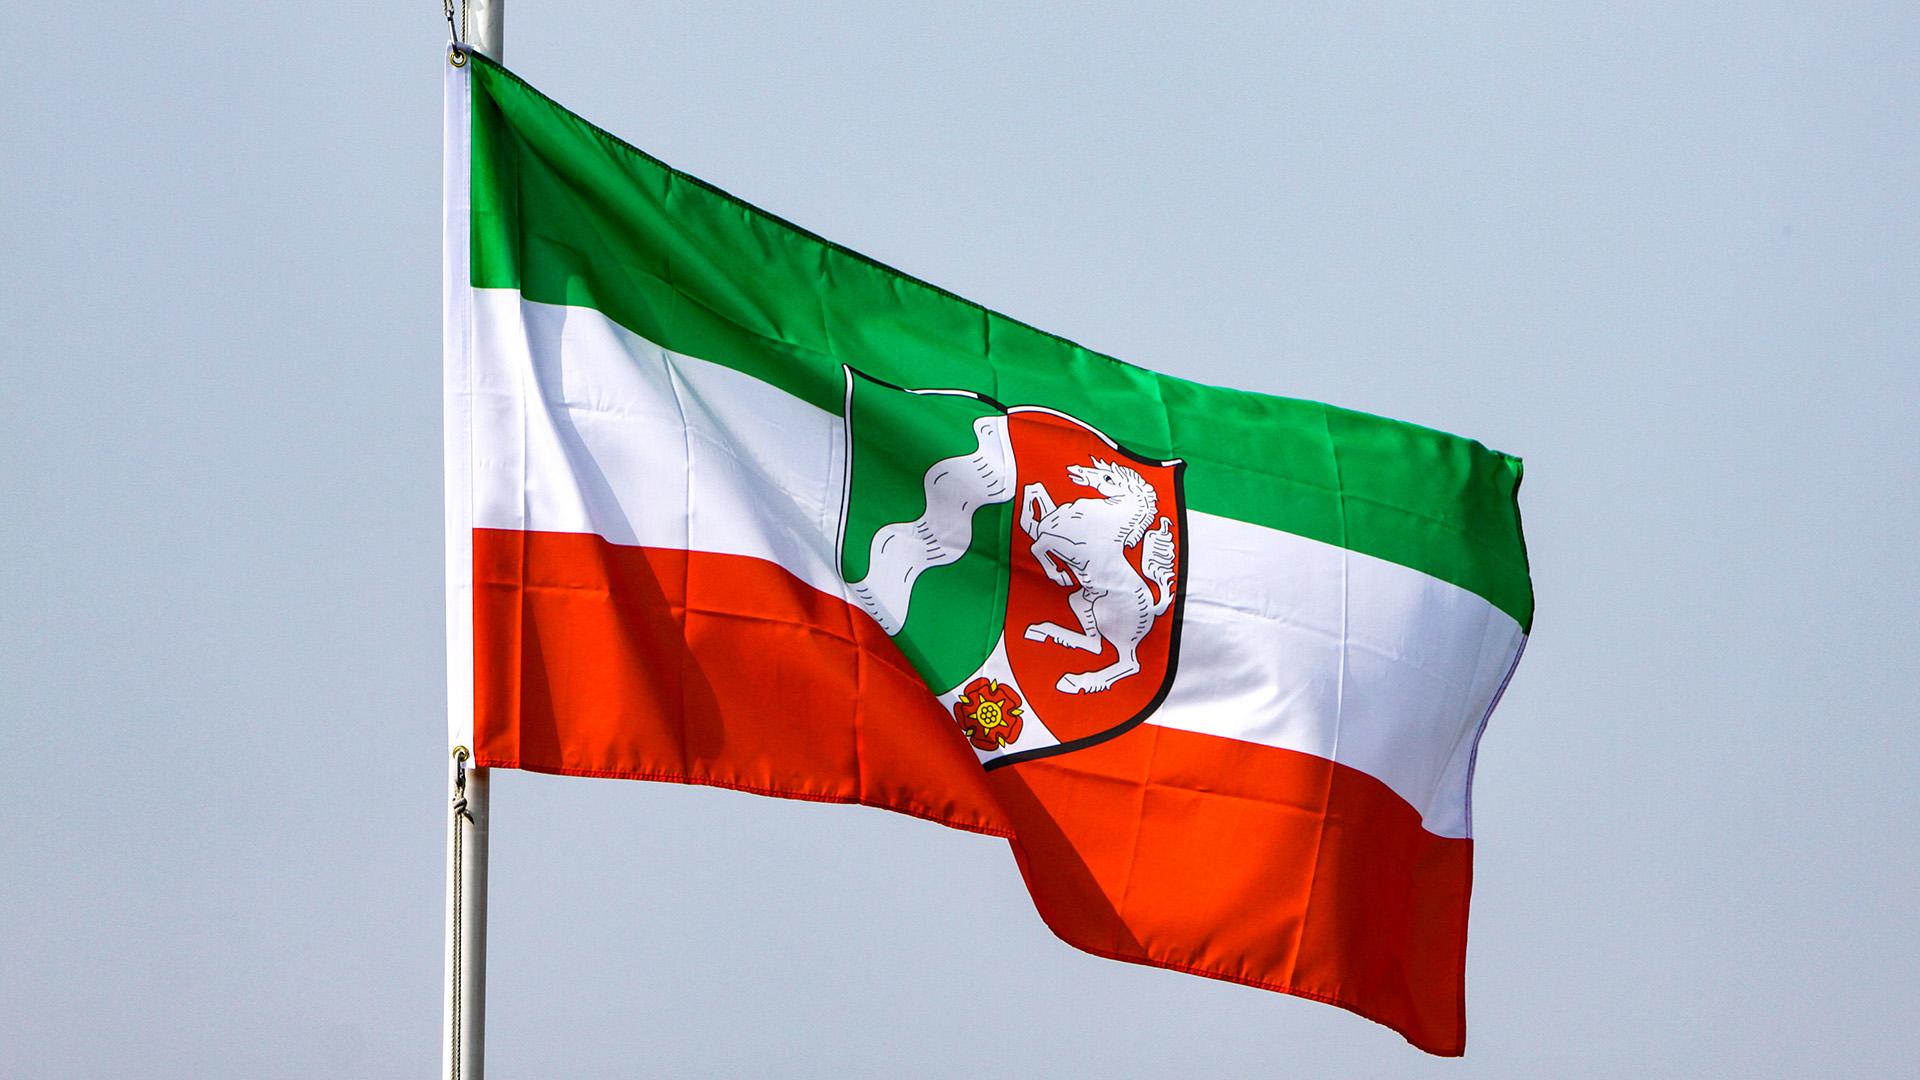 20kw37 NRW Fahne